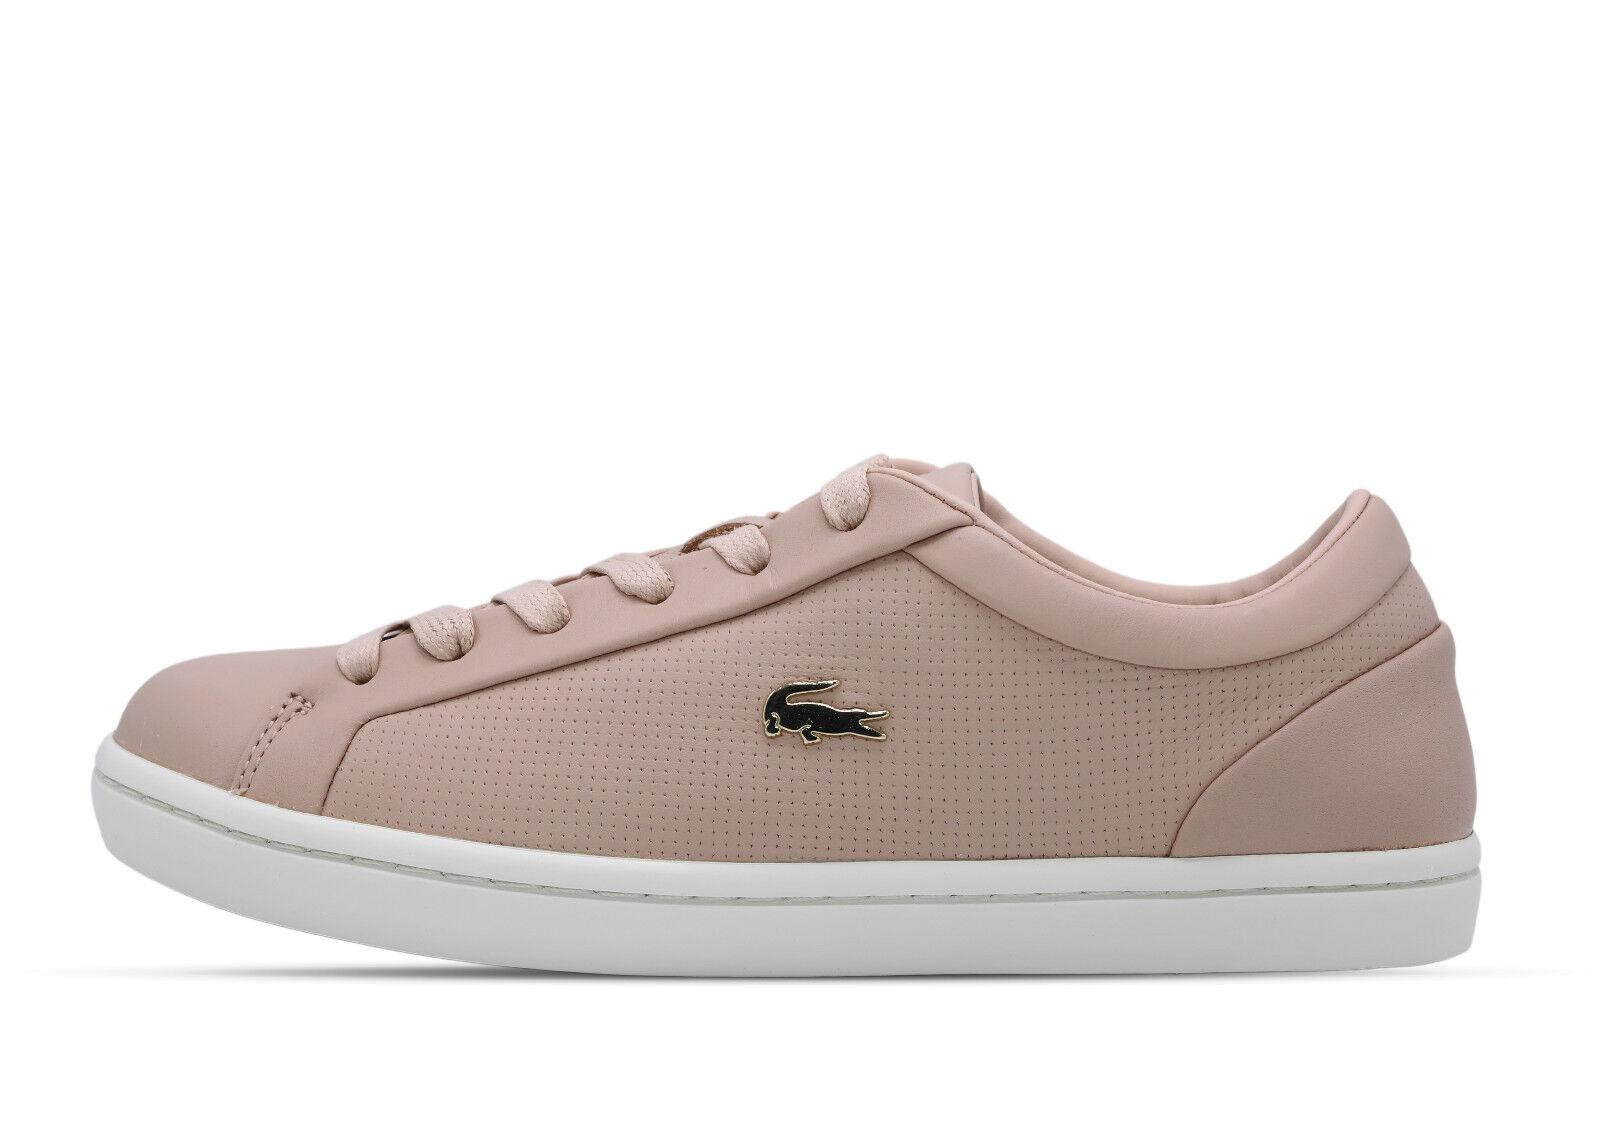 Lacoste Straightset Natural Navy 735CAW0065NN2 - Sneaker - rosa +Neu+ - Damens +Neu+ rosa b5512f